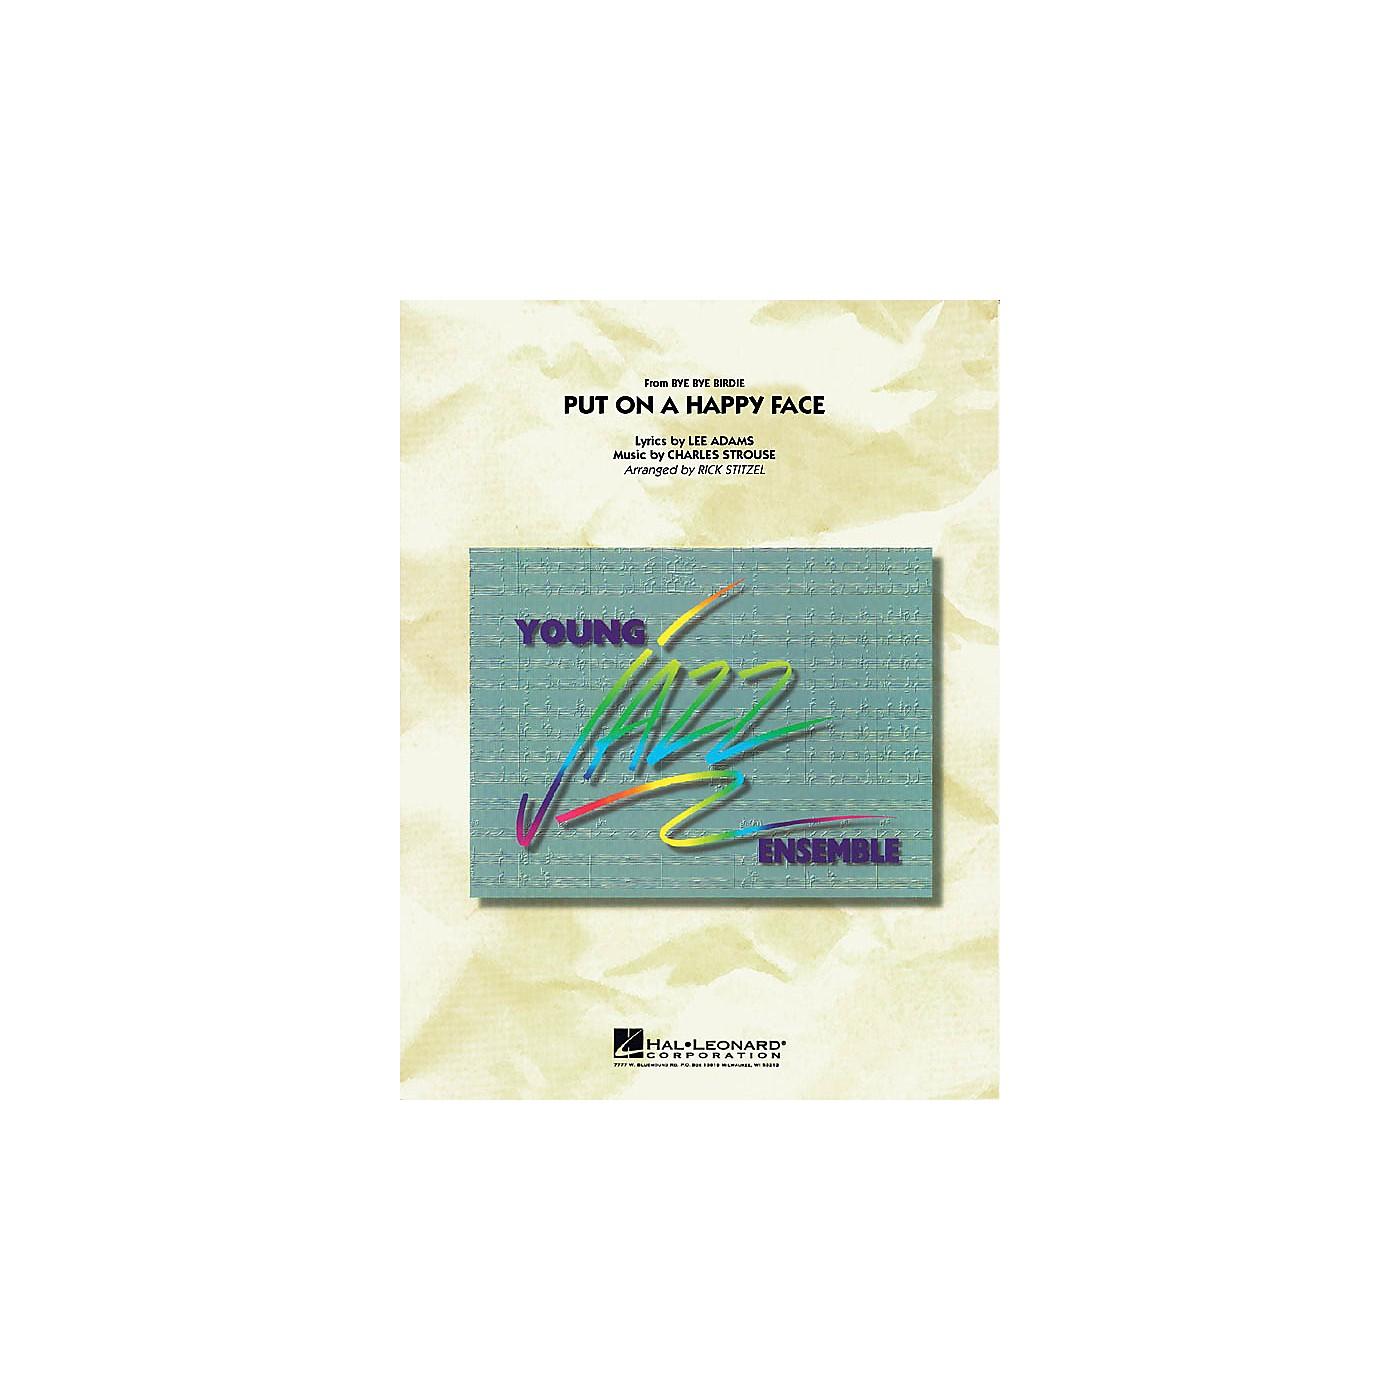 Hal Leonard Put On a Happy Face (from BYE BYE BIRDIE) Jazz Band Level 3 Arranged by Rick Stitzel thumbnail